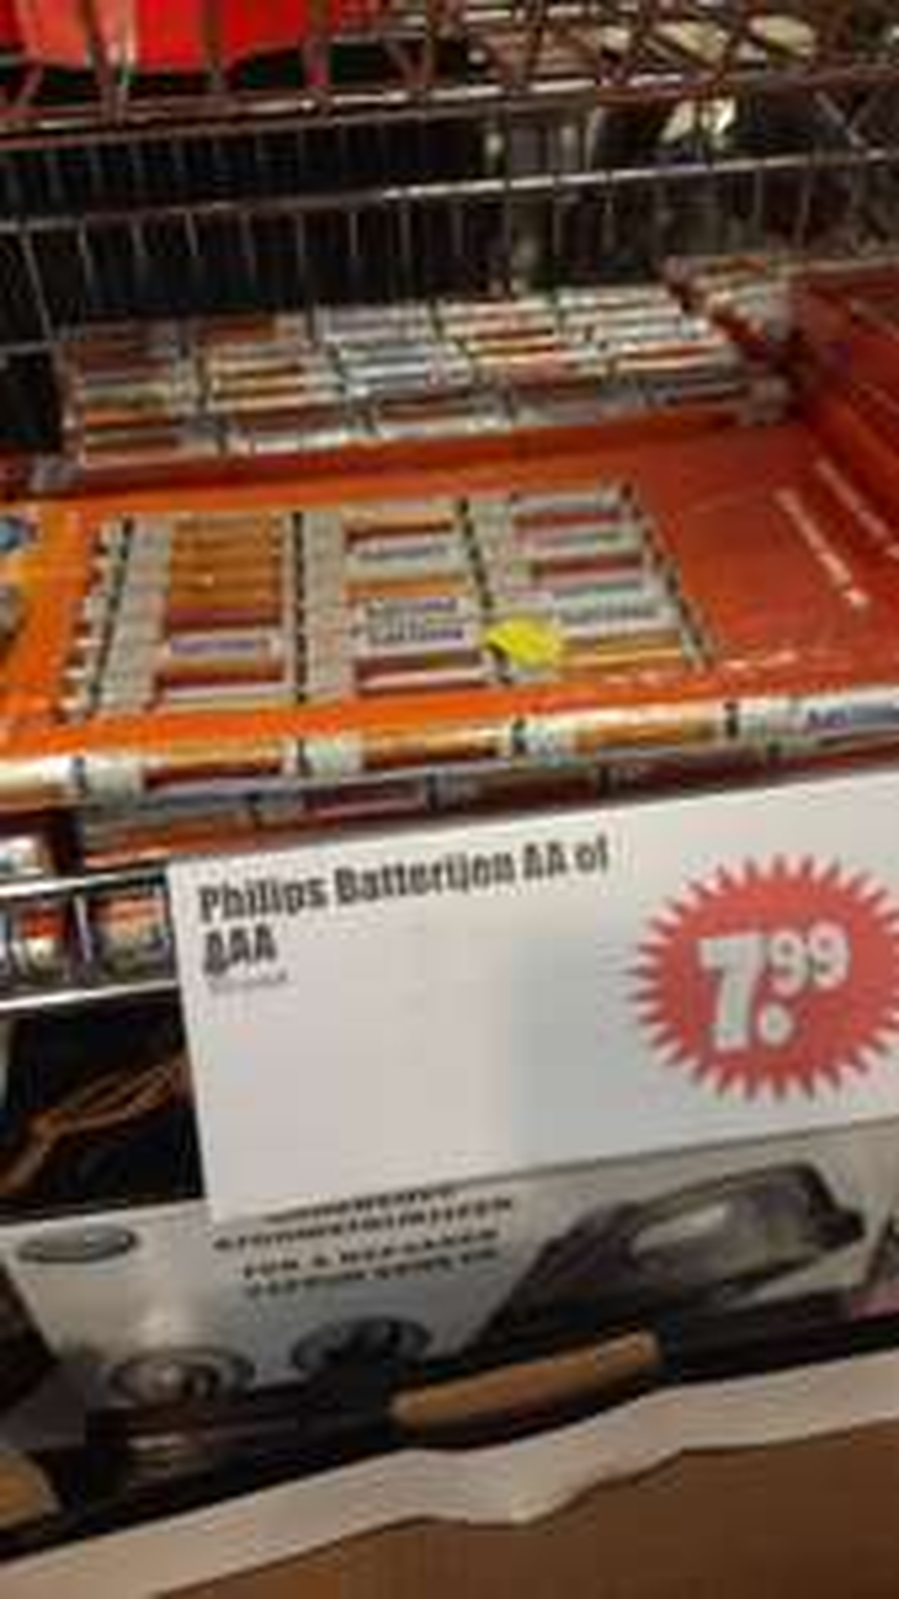 Philips Power Alkaline 50-pack AA of AAA batterijen!